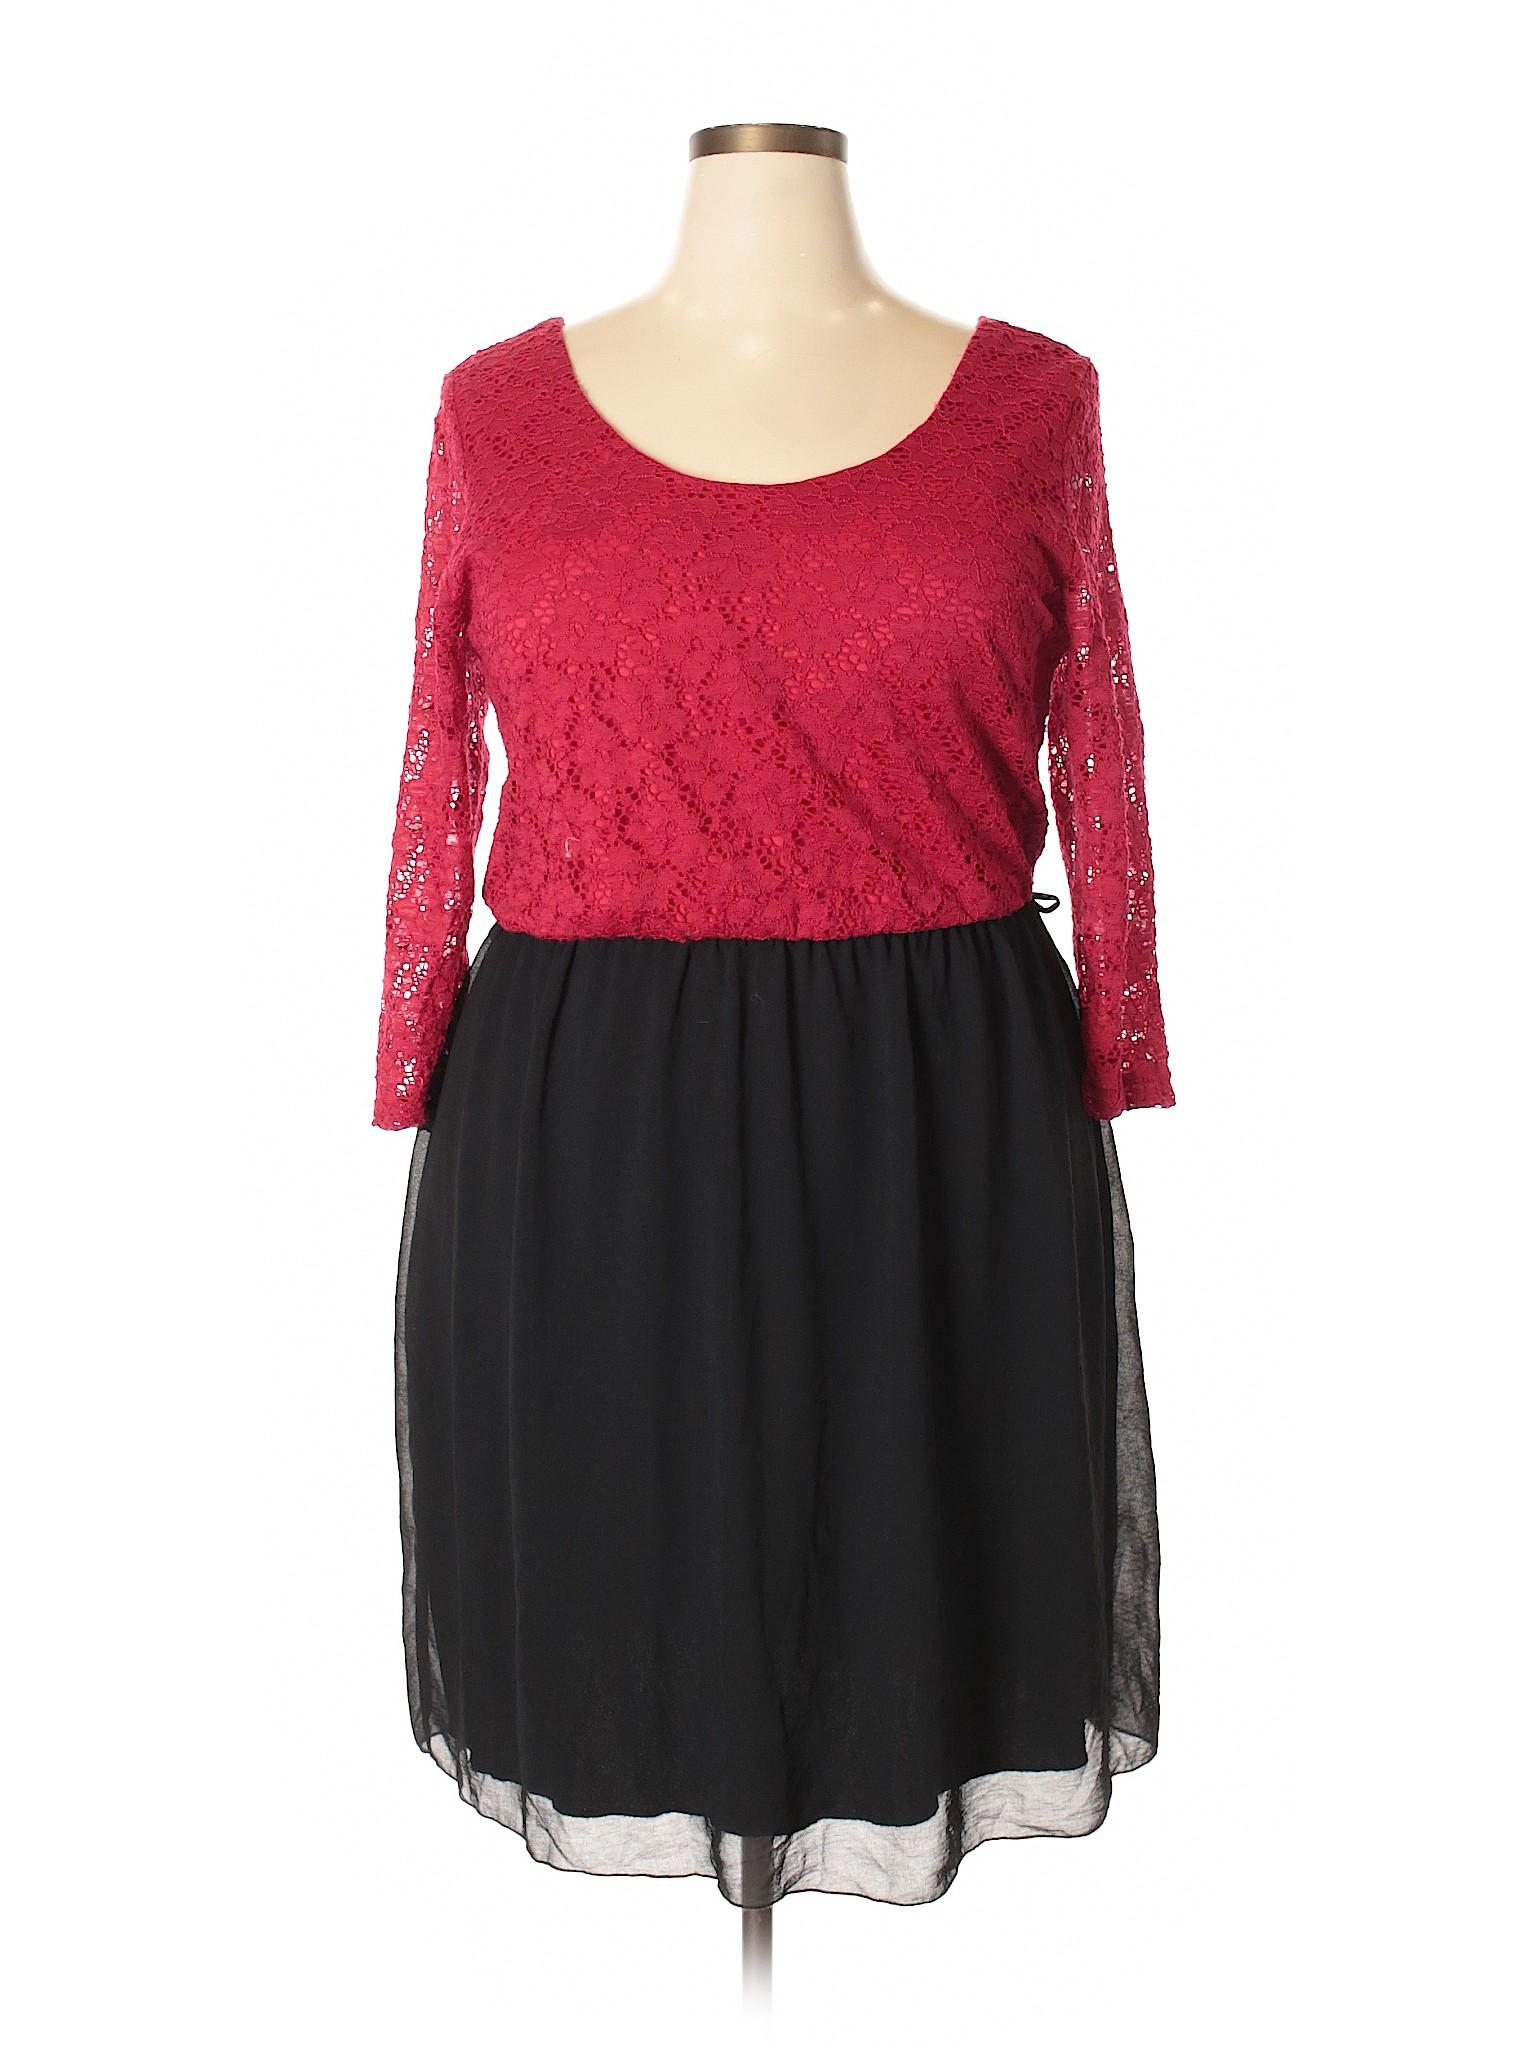 Dress winter Boutique TO FIGURE FASHION Casual 4BPqxa8w